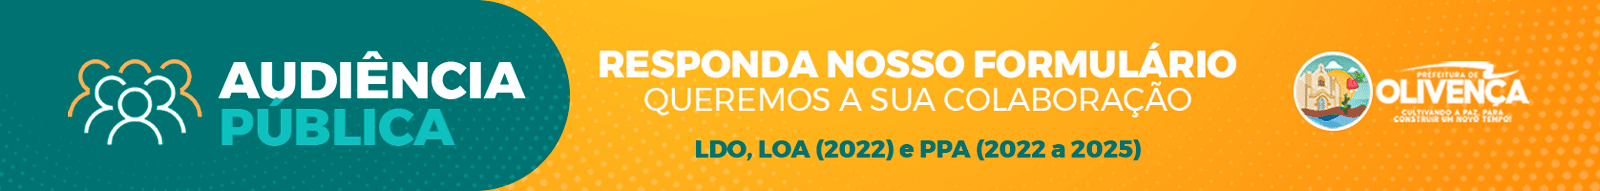 Banner Audiência Pública